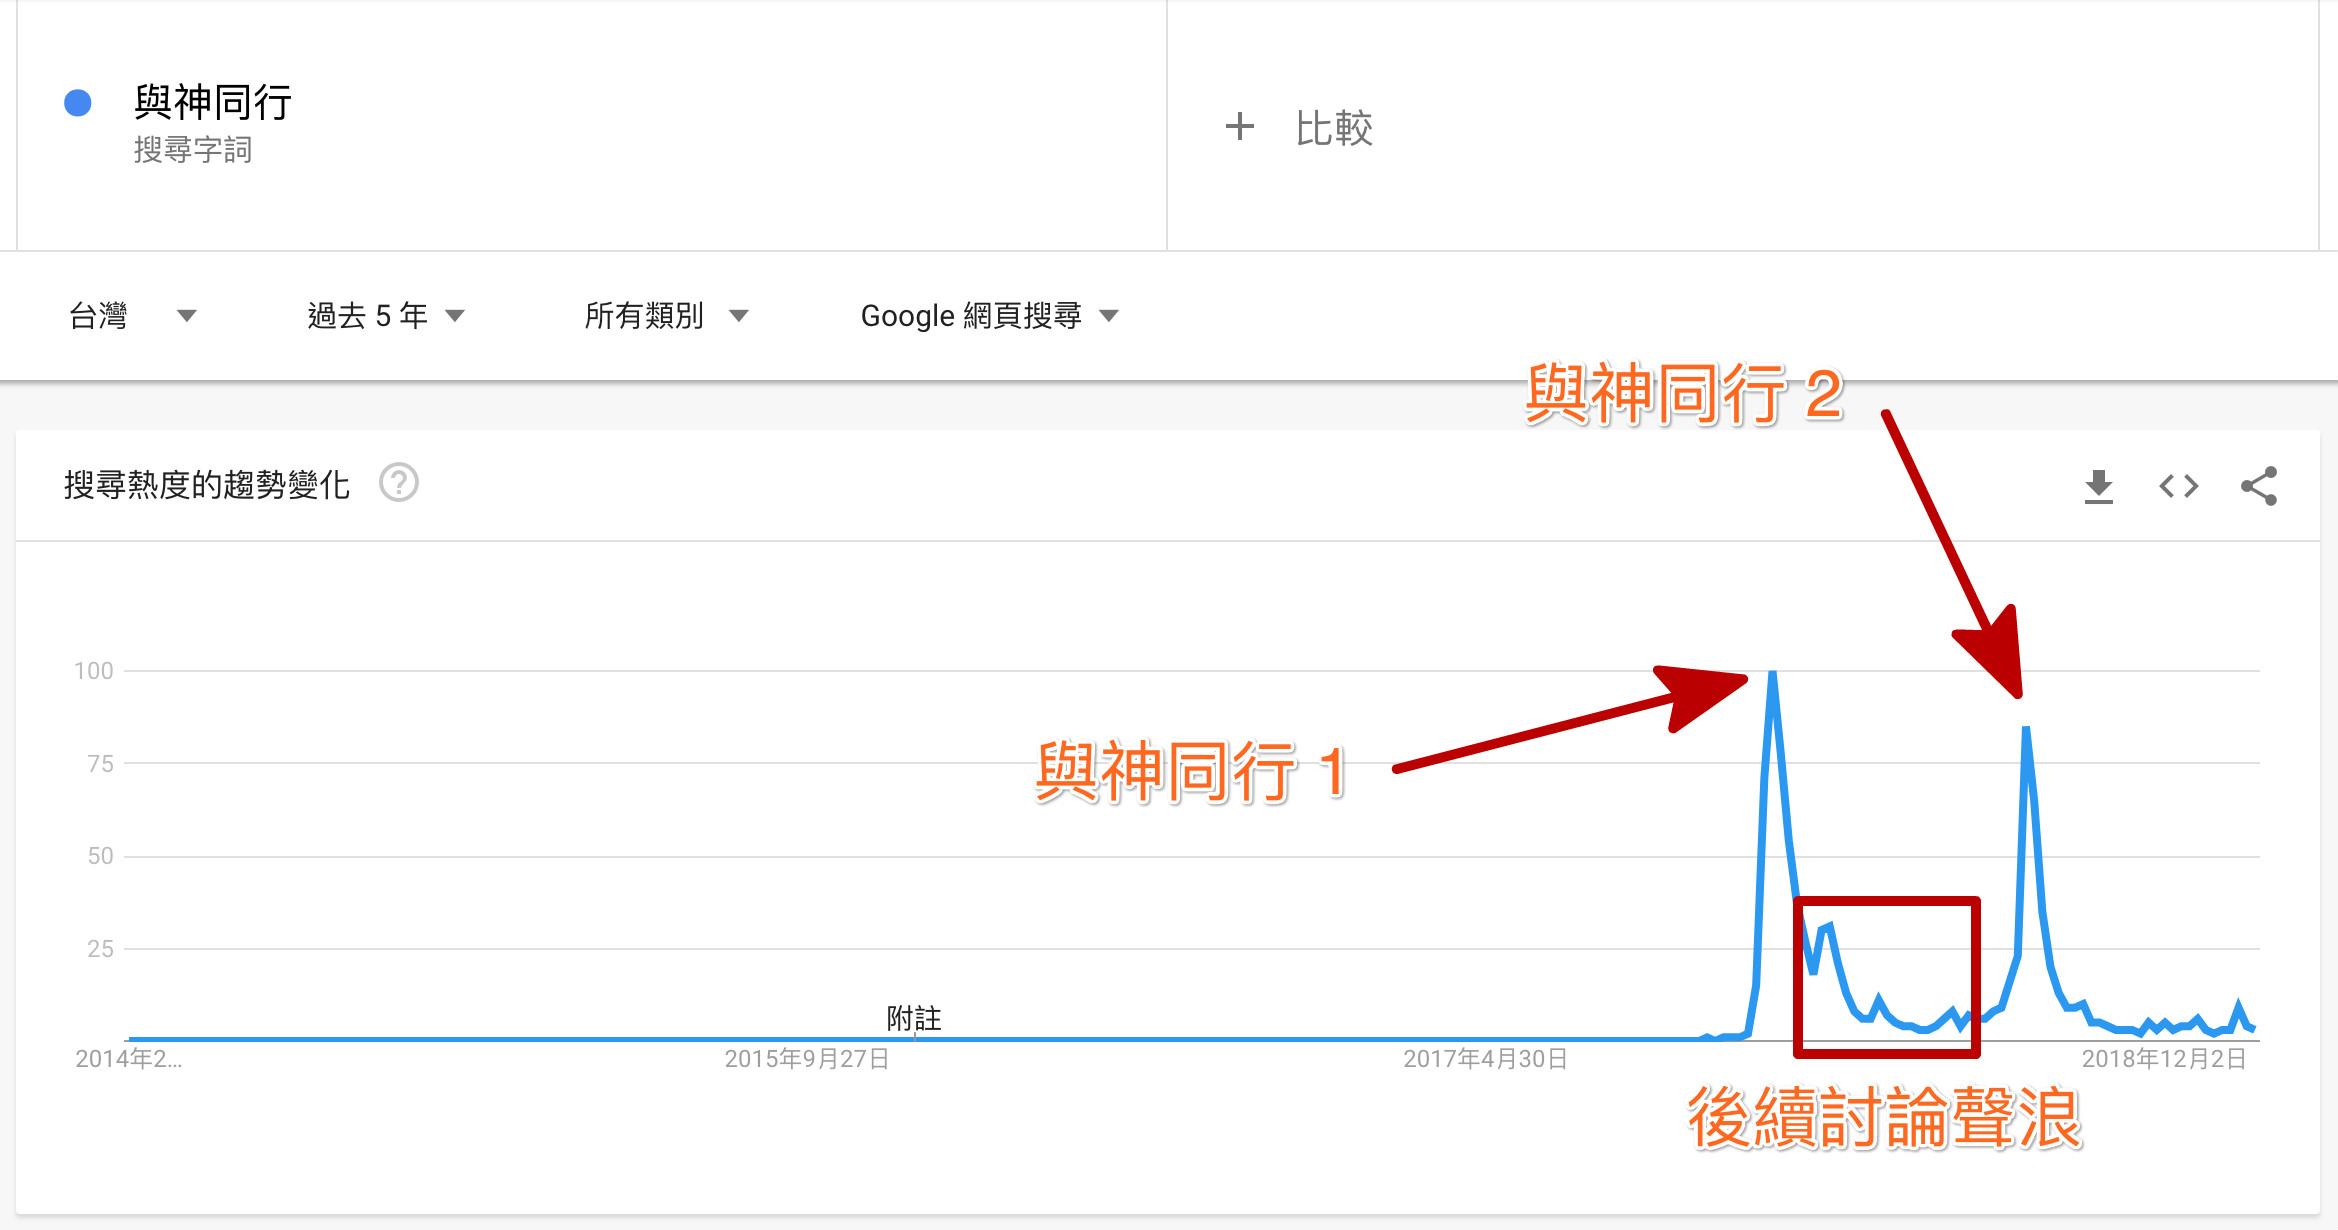 Google Trends 與神同行的搜尋量